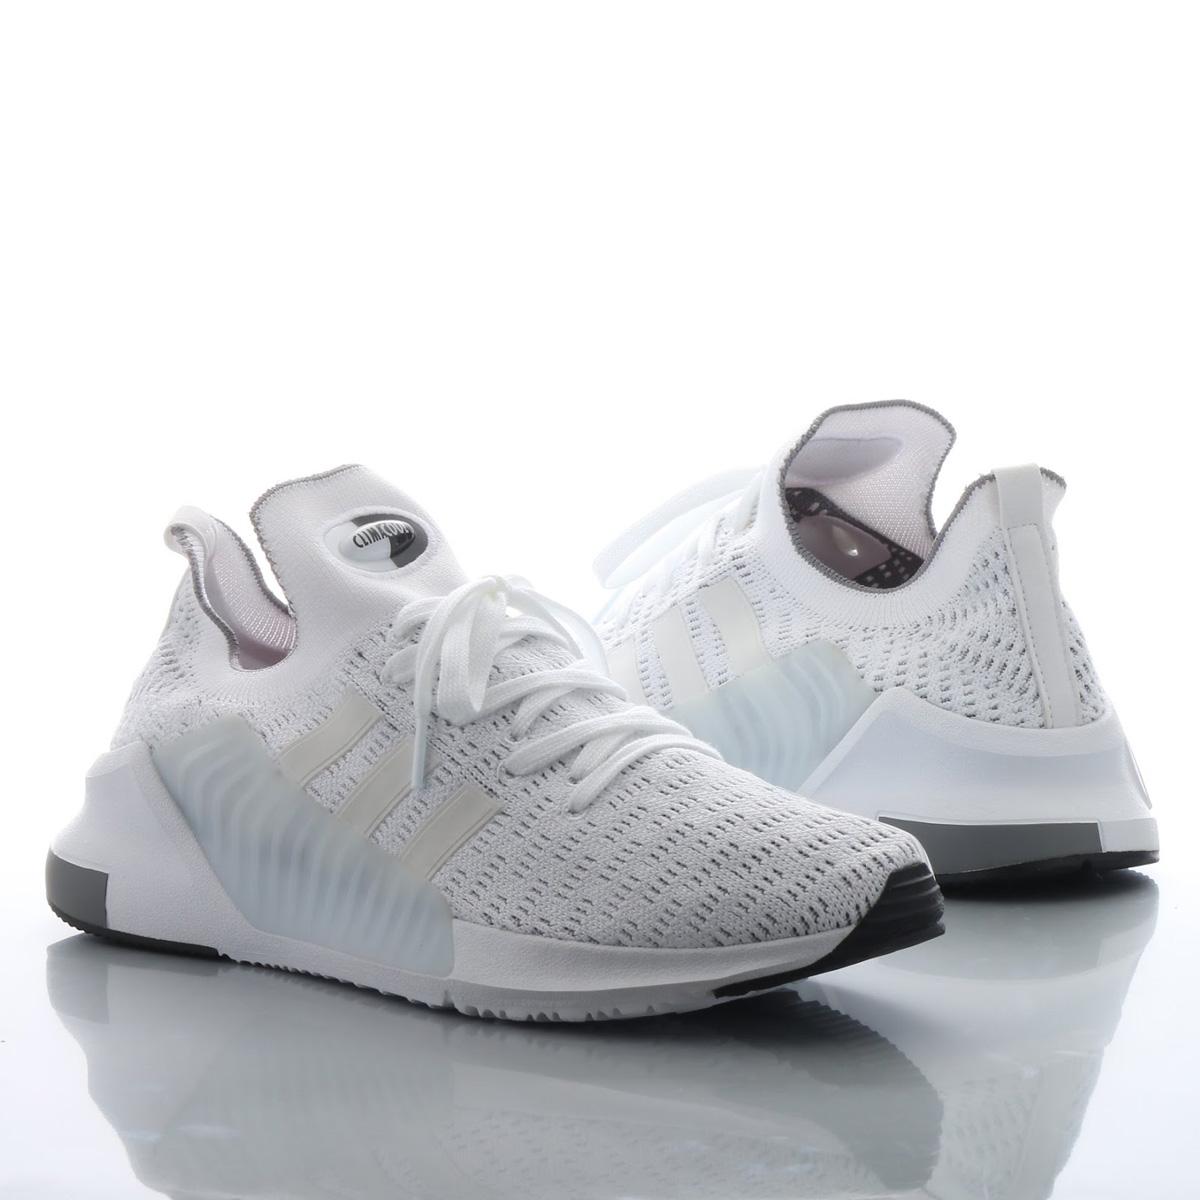 adidas Originals CLIMACOOL 02/17 PK(アディダス オリジナルス クライマクール 02/17 PK)Running White/Running White/Grey【メンズ スニーカー】18SS-S